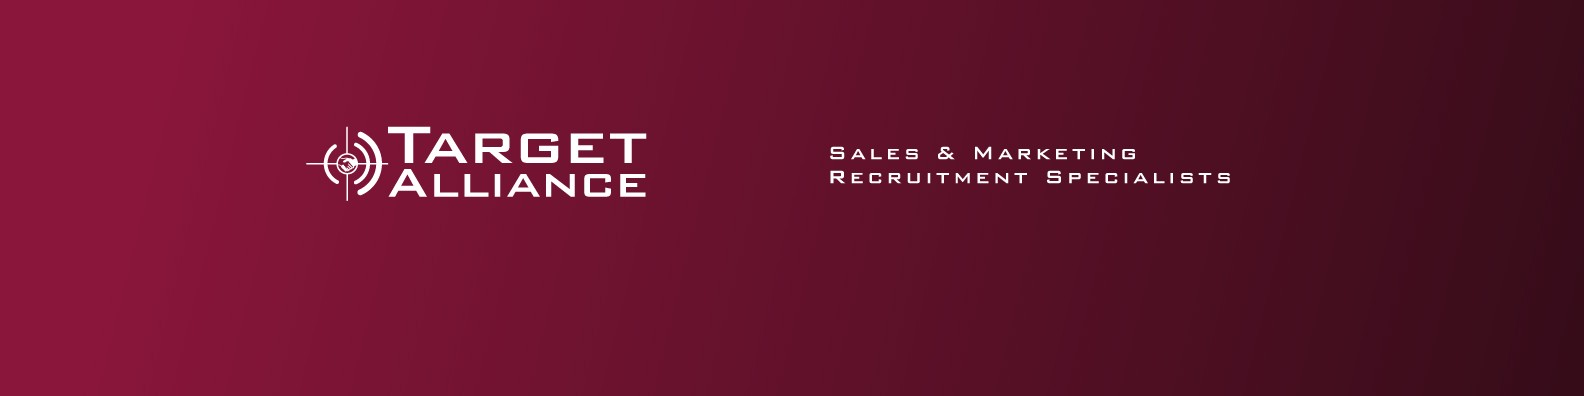 Target Alliance - the ITC Sales & Marketing Recruitment